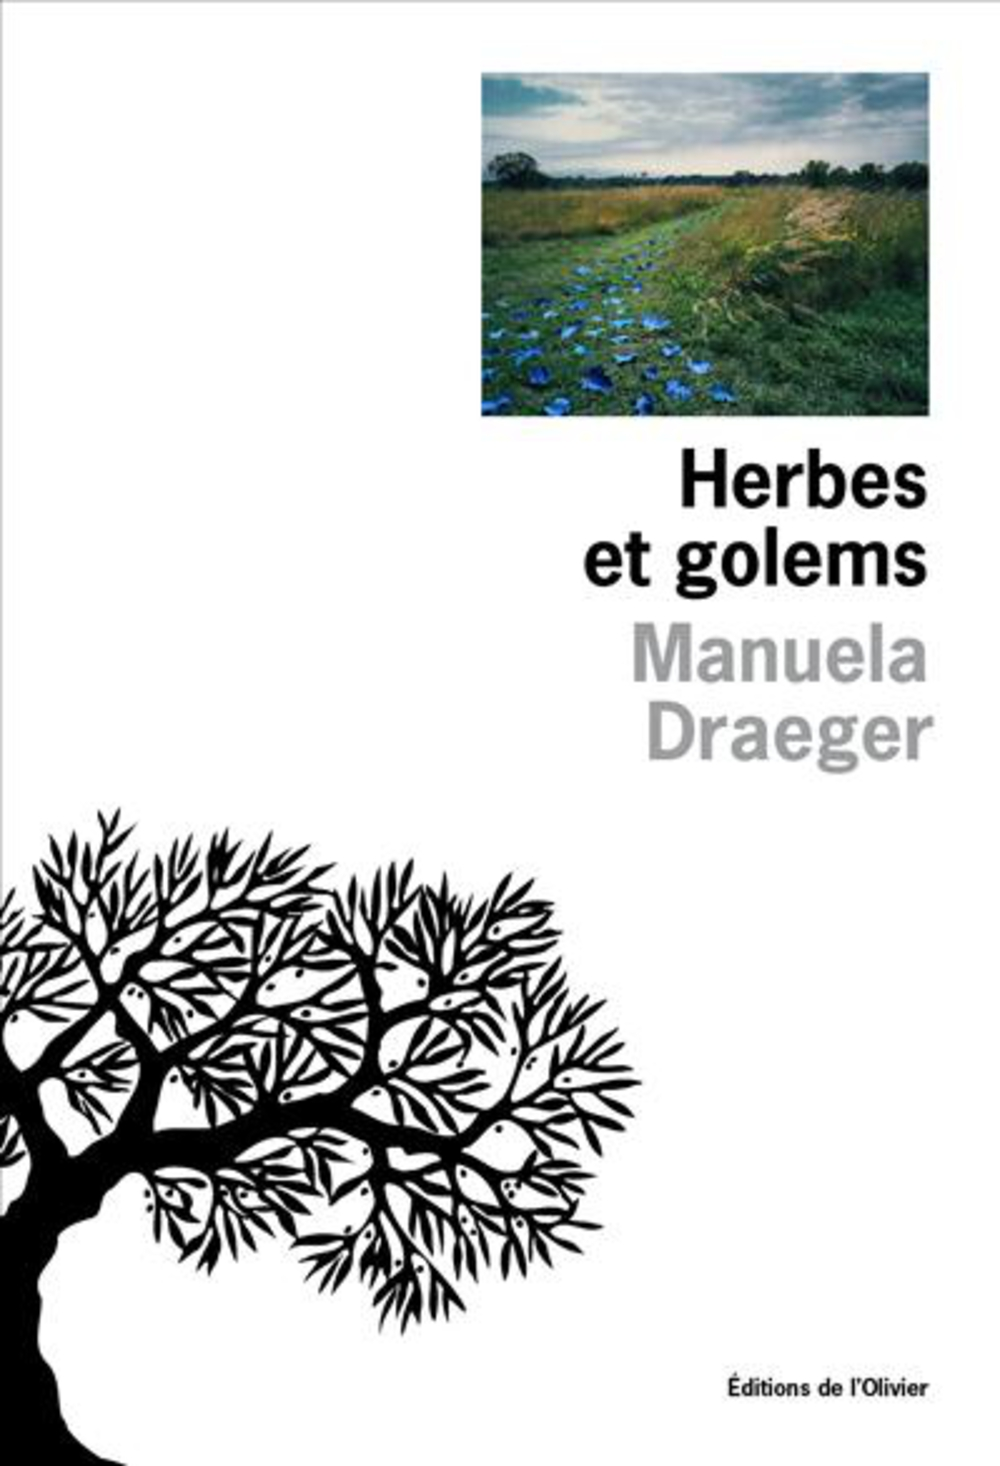 http://hermitecritique.files.wordpress.com/2012/08/herbes-et-golems-manuela-draeger.png